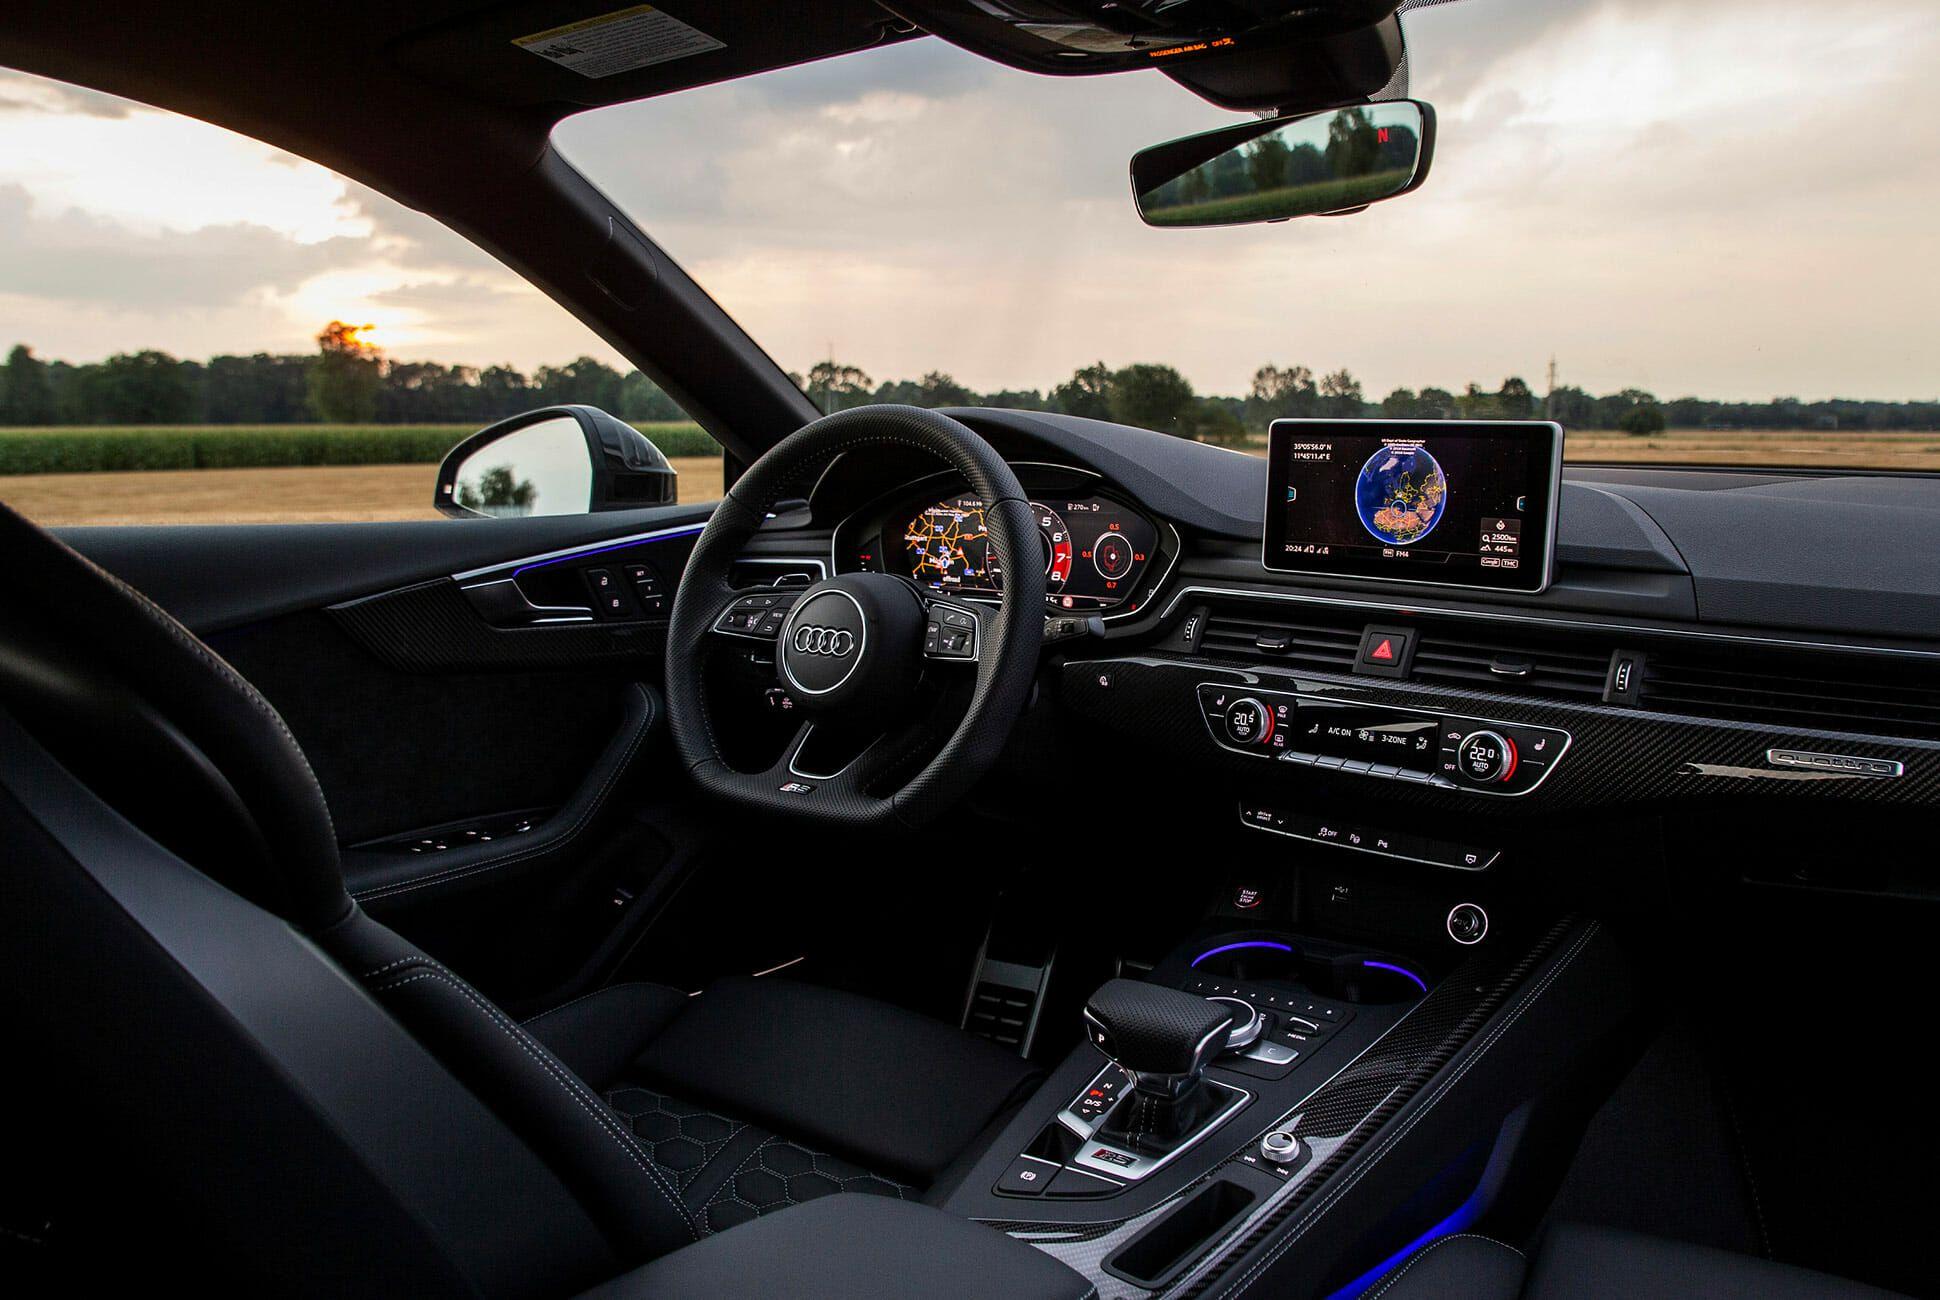 Audi-RS5-Sportback-Review-gear-patrol-slide-11